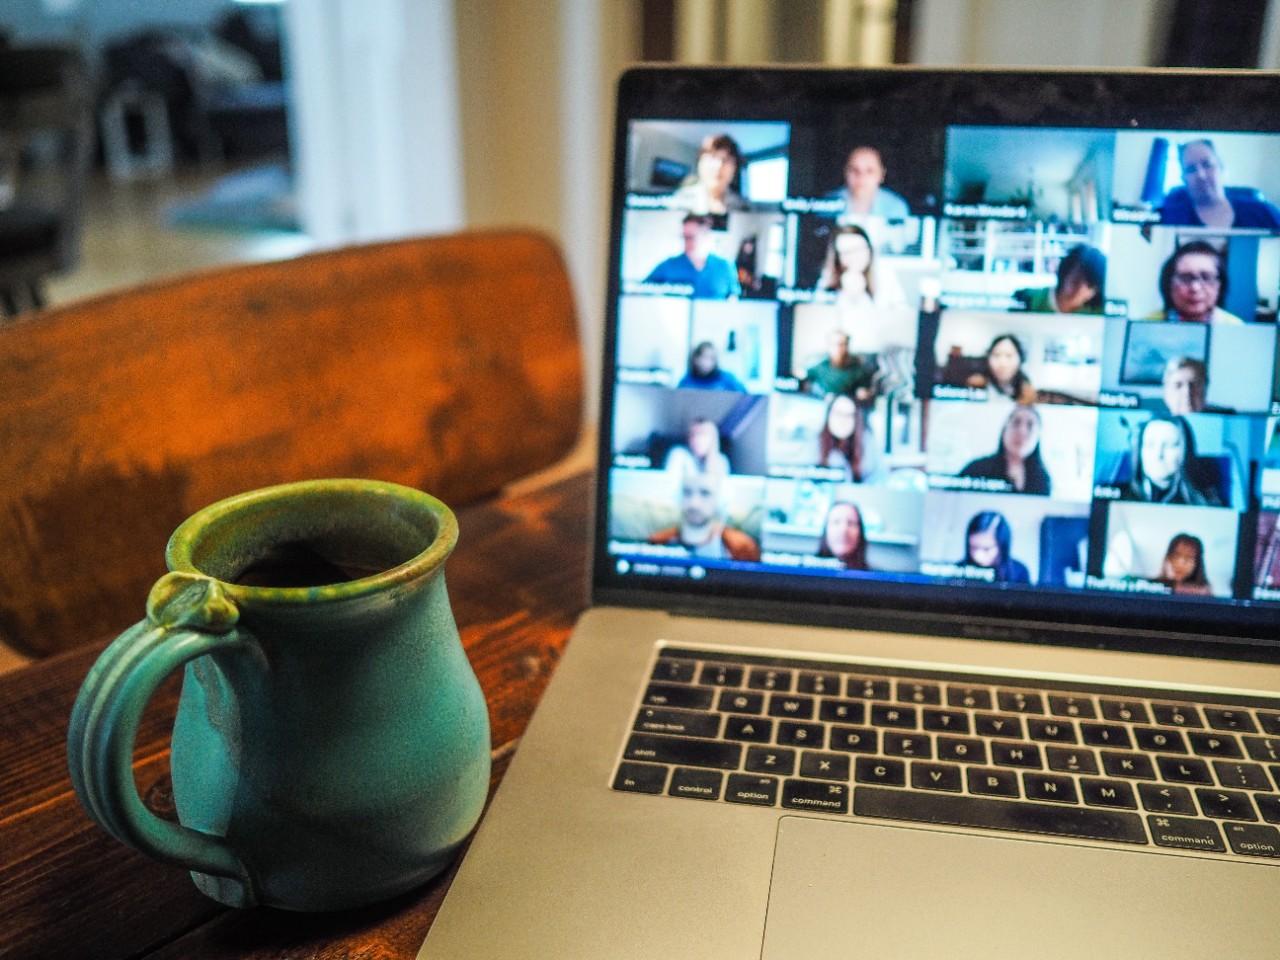 Zoom presentation on a laptop.